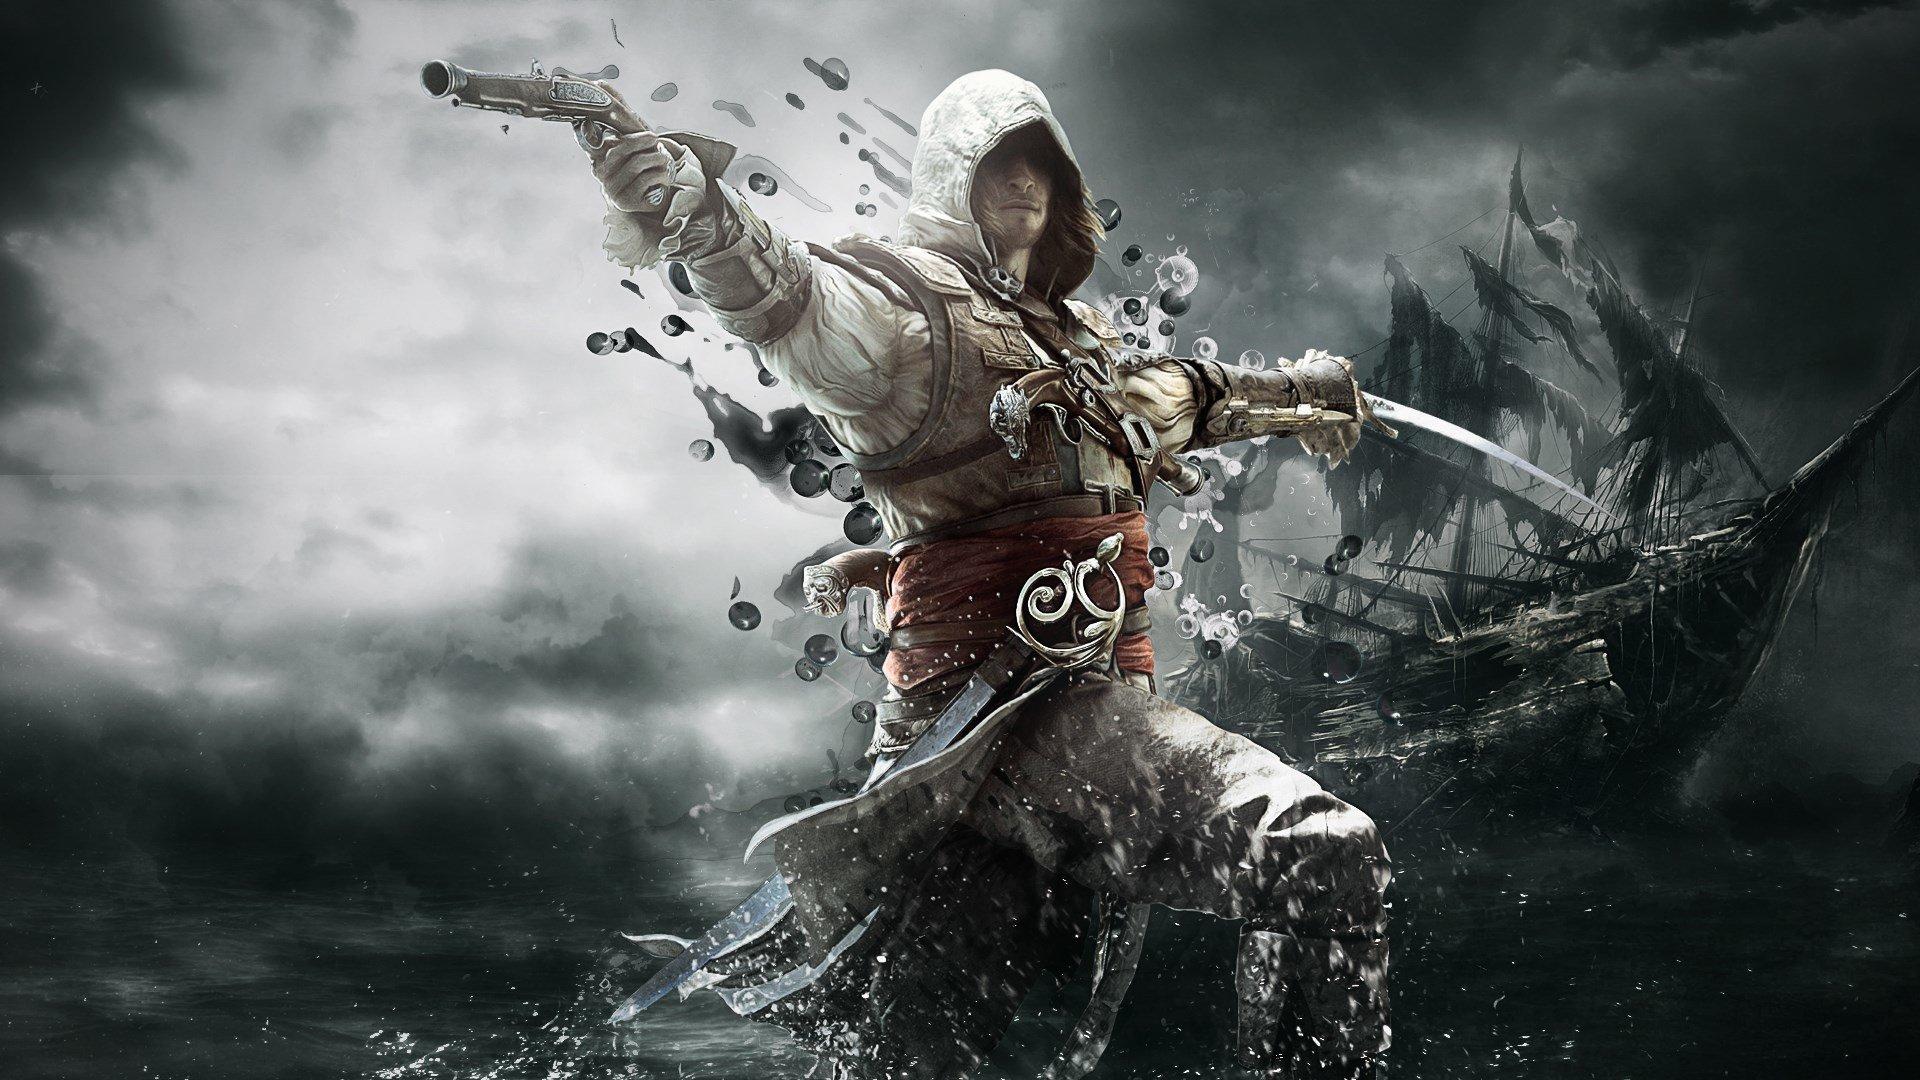 Assassin 39 s creed iv black flag full hd sfondo and sfondi for Assassin s creed sfondi